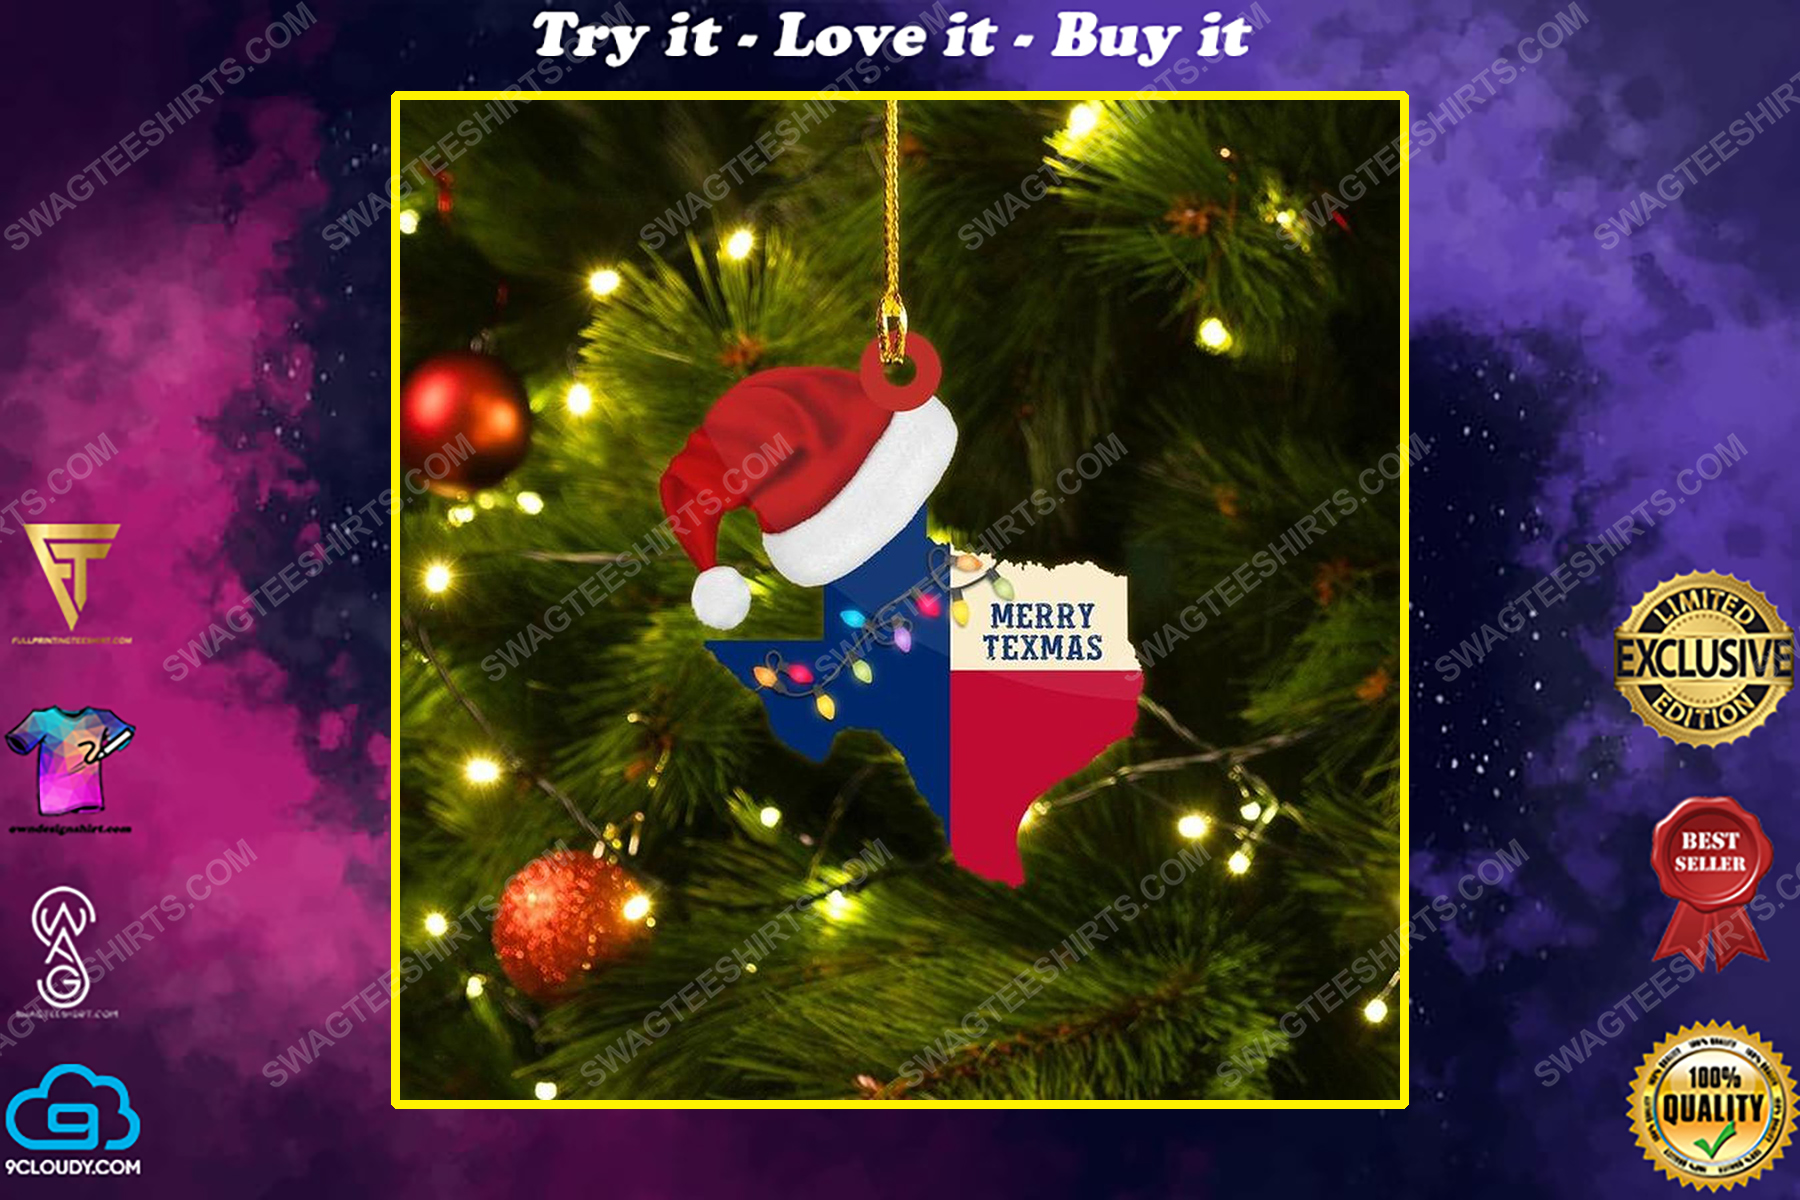 Merry texmas texas christmas gift ornament